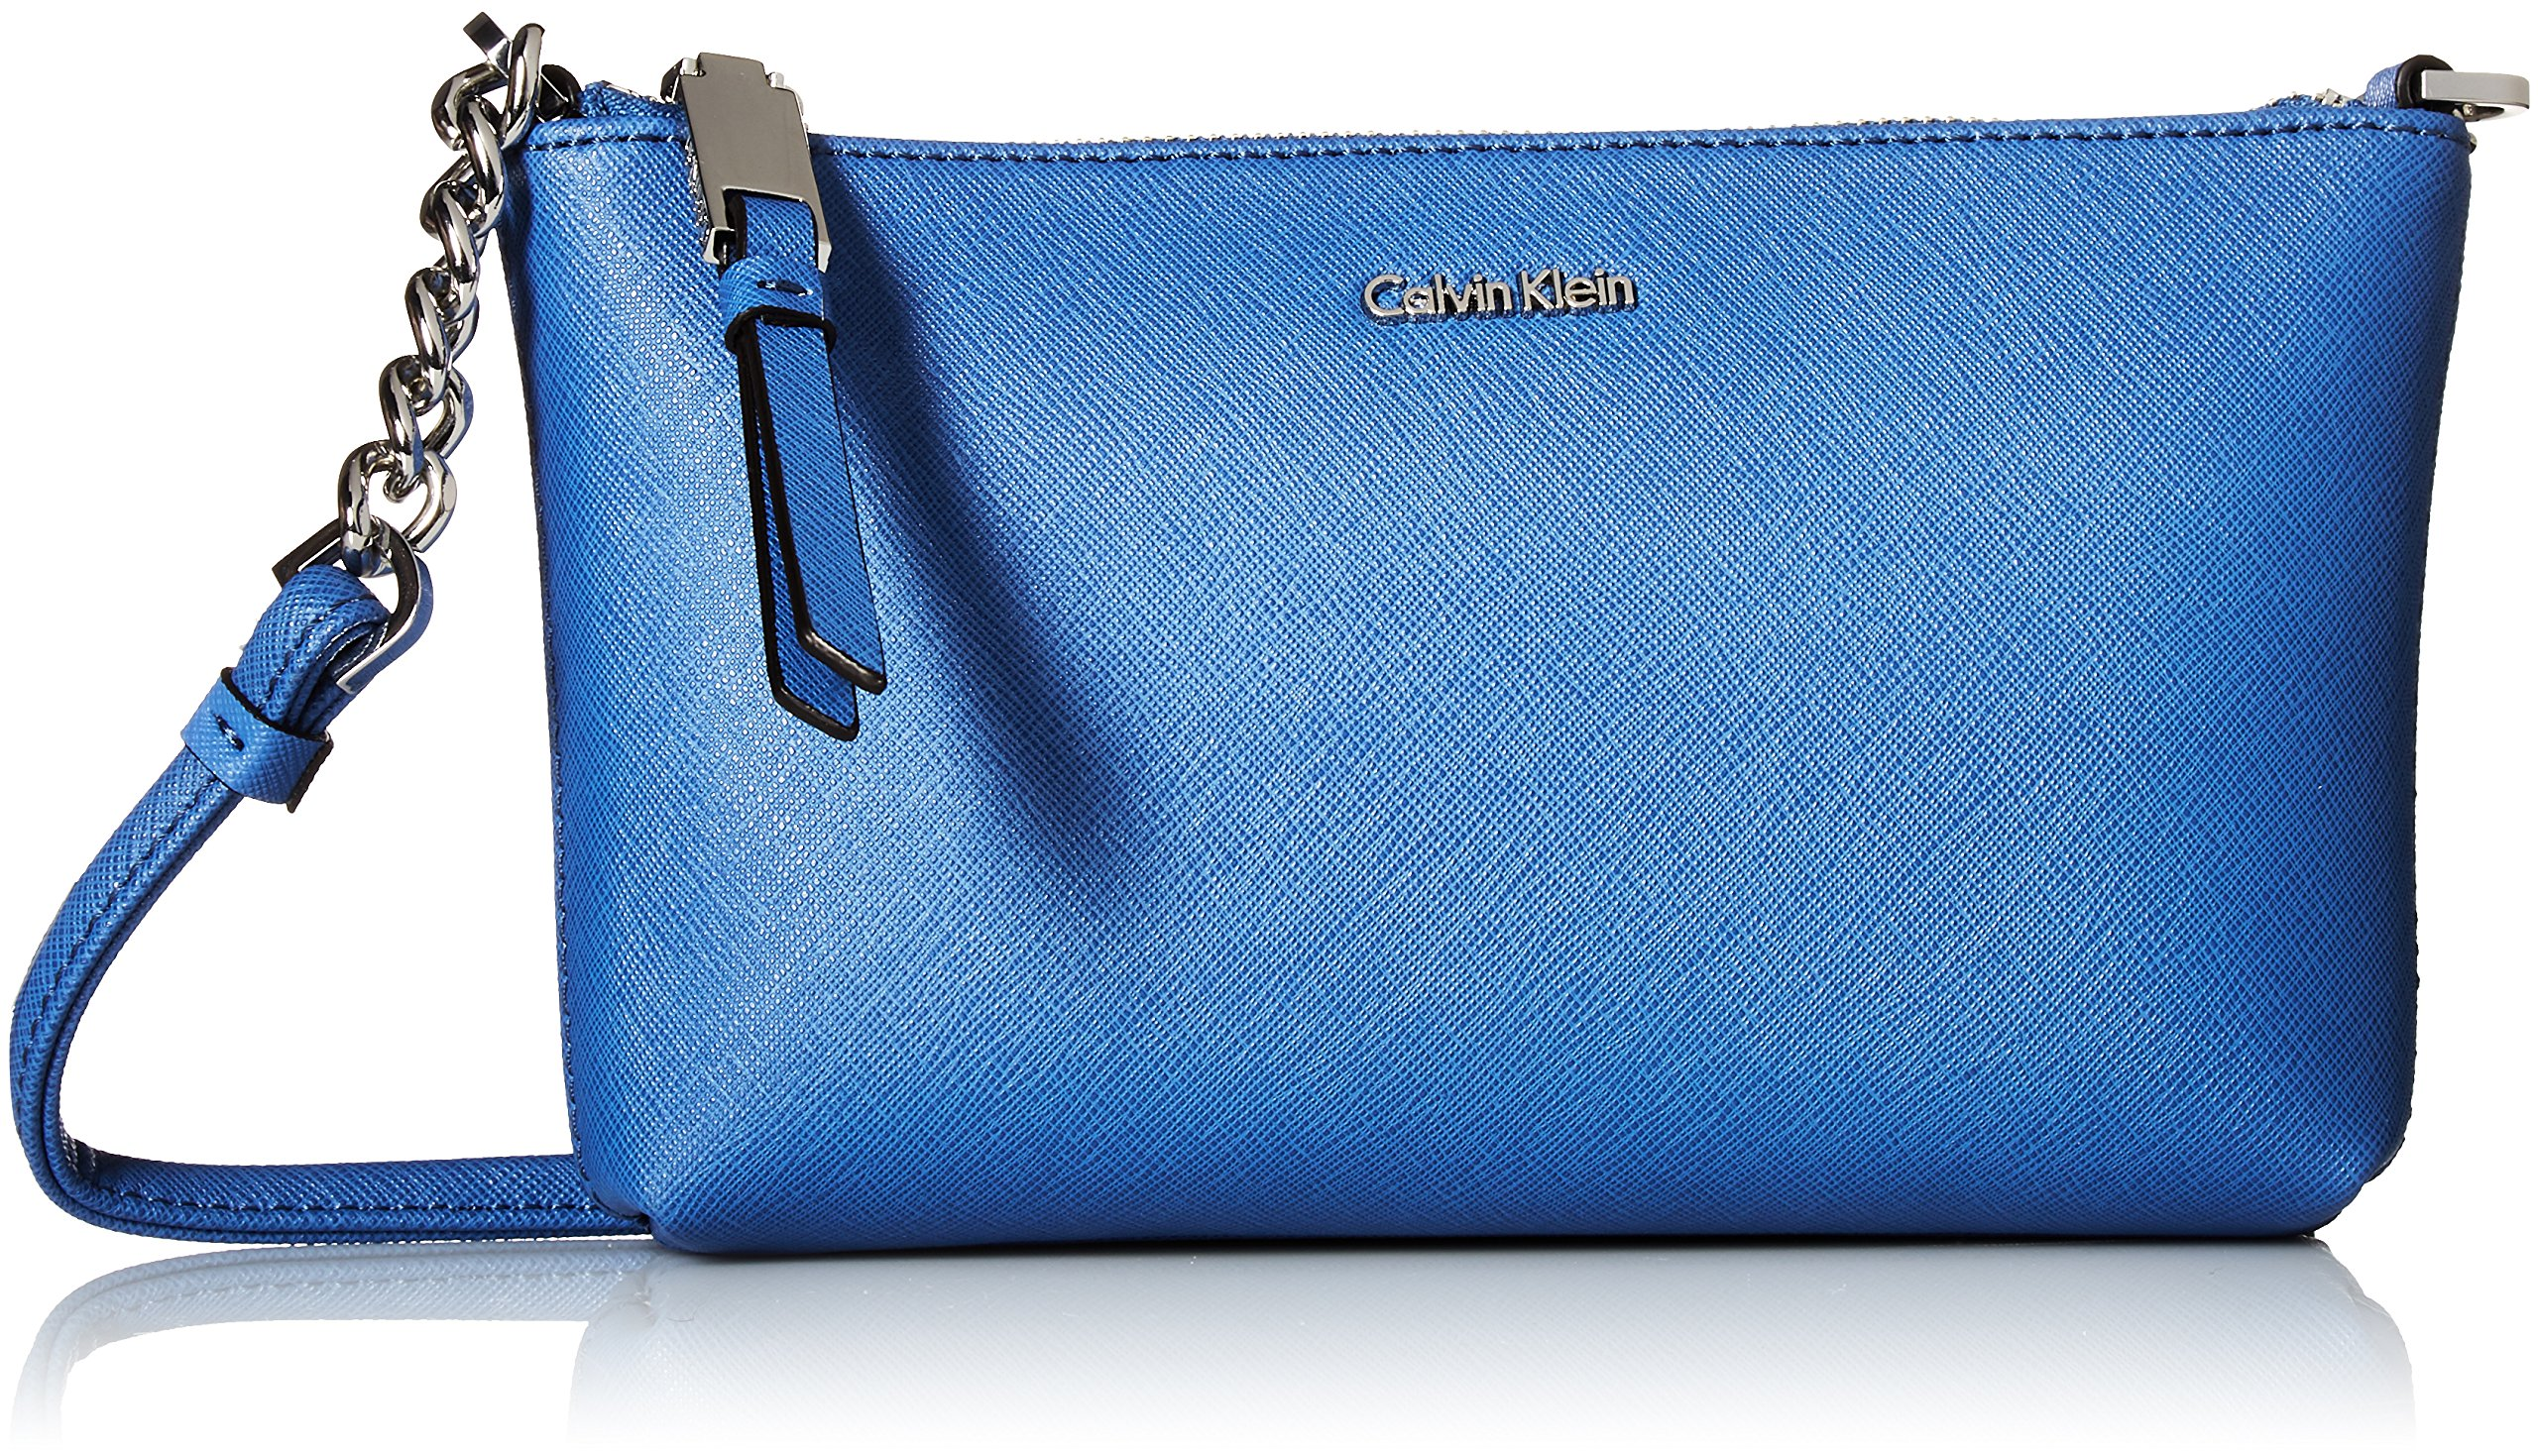 Calvin Klein Hayden Saffiano Leather Crossbody, Periwinkle